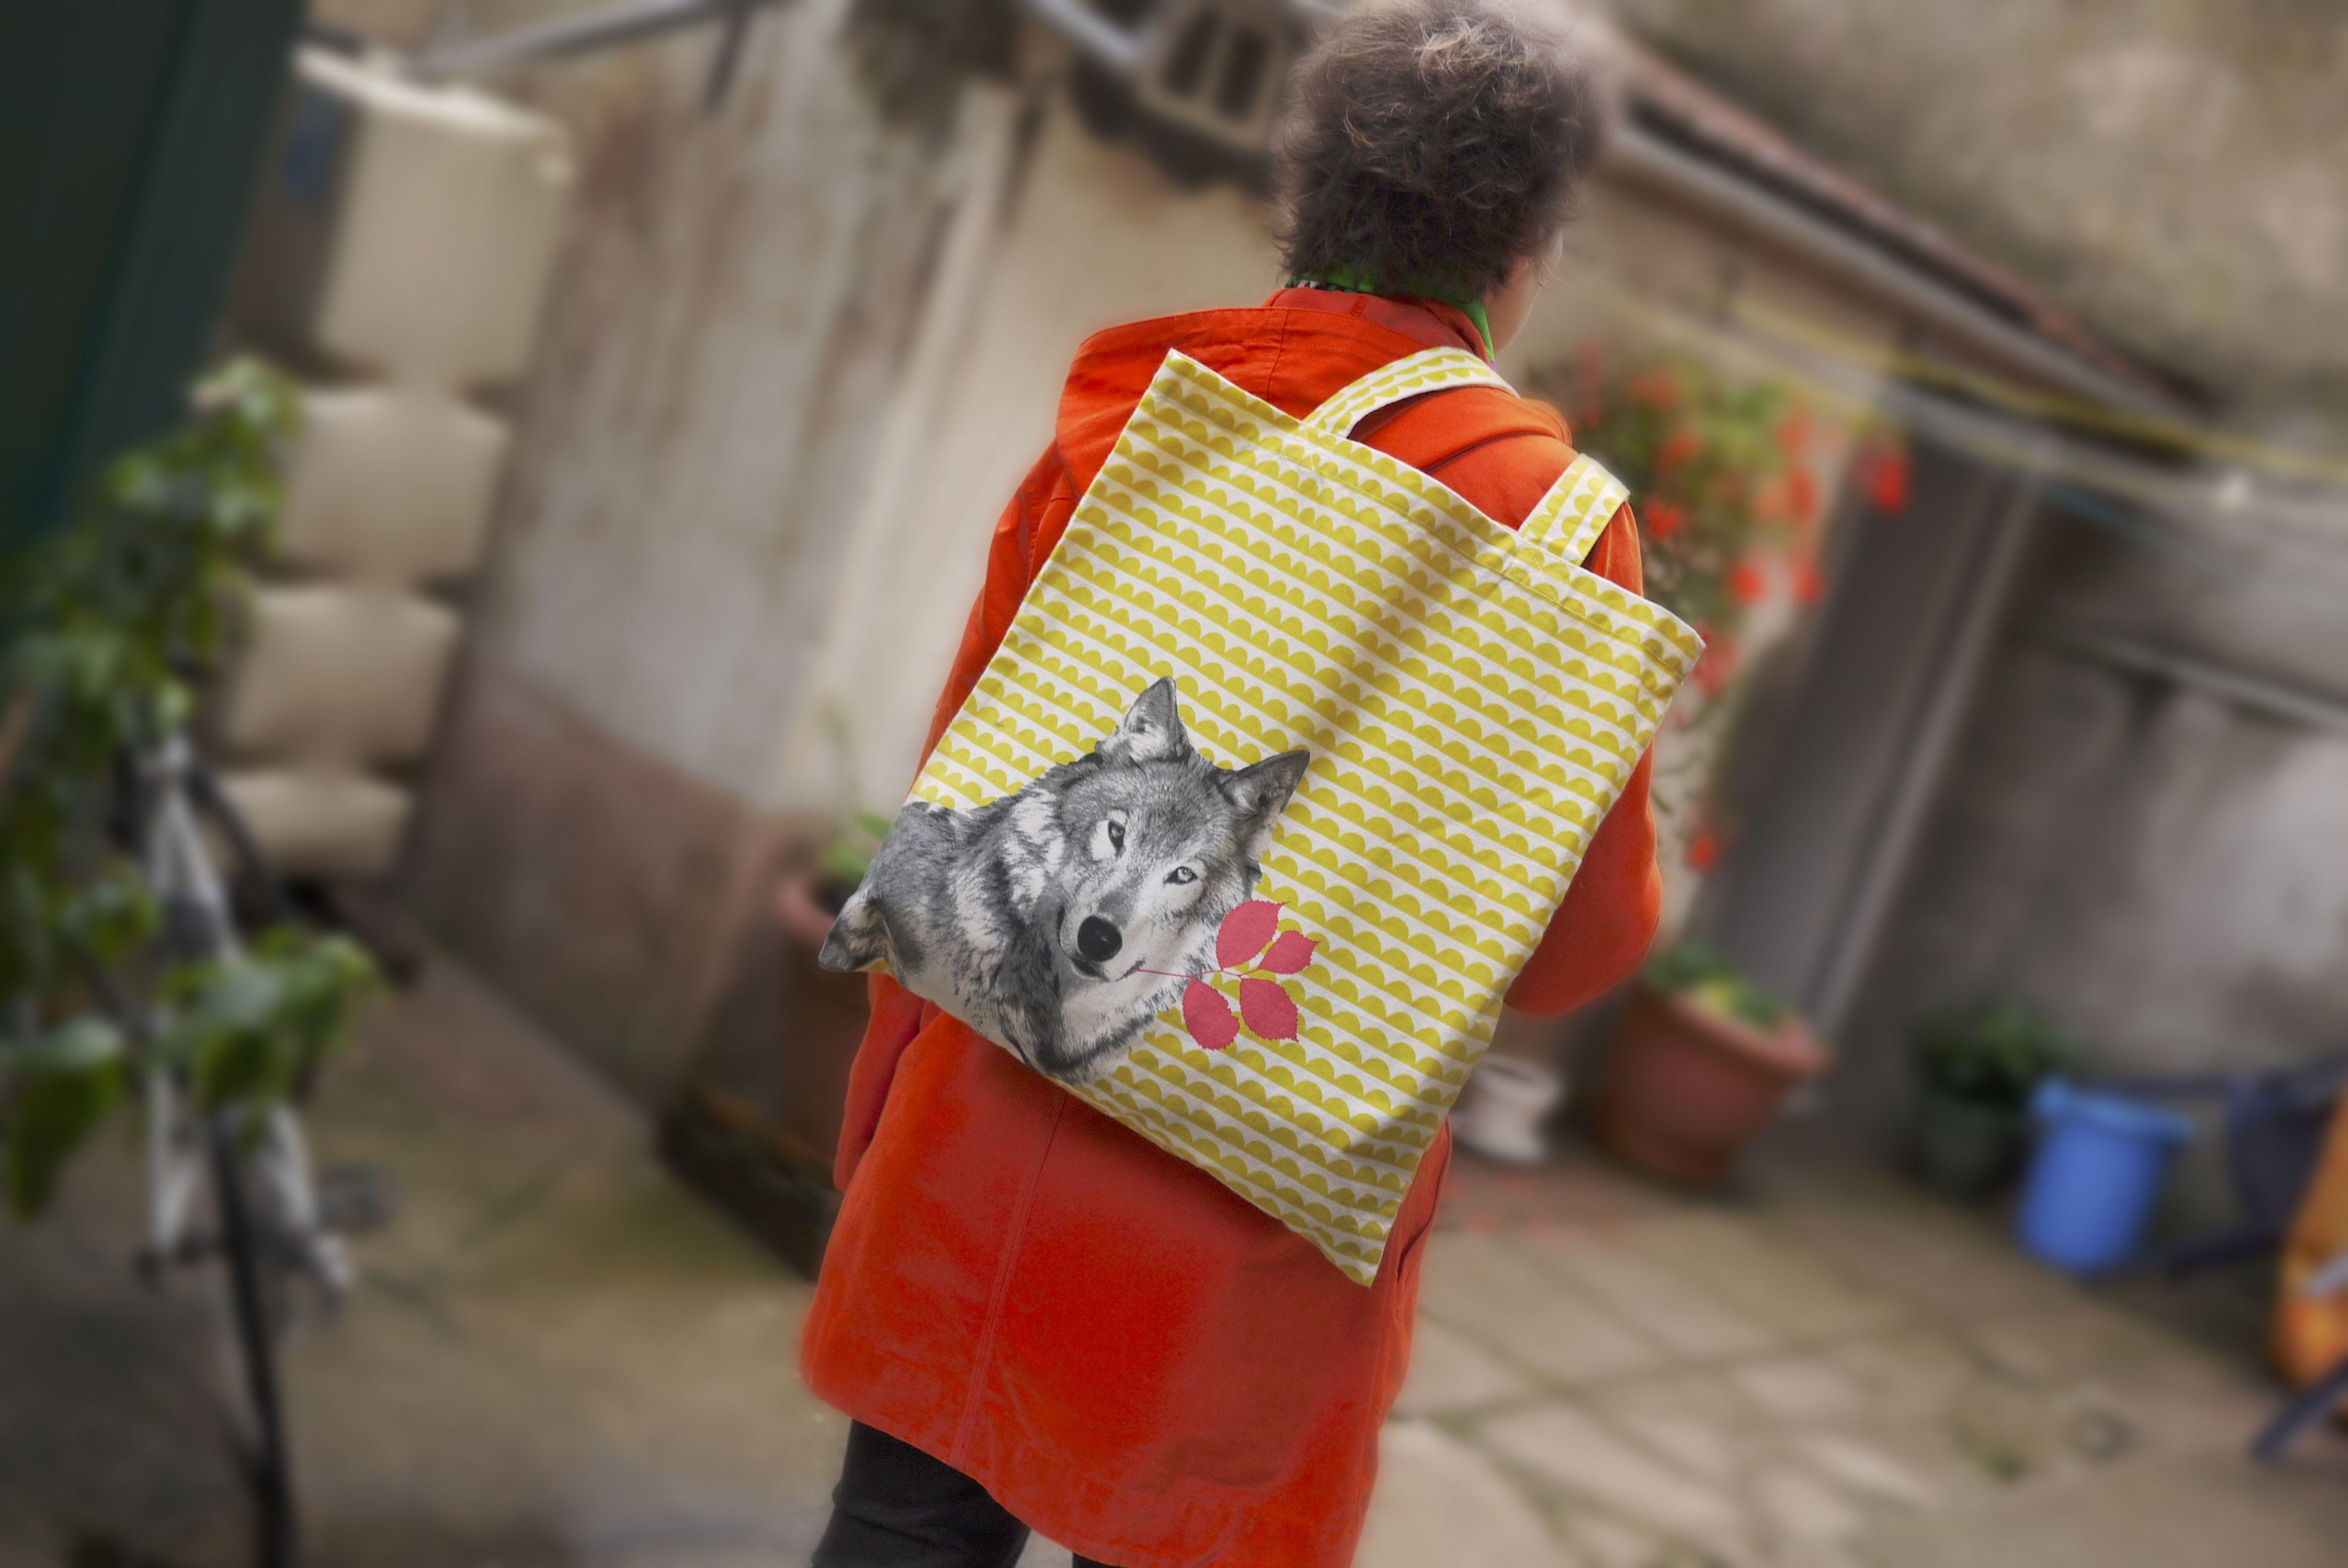 Collection clairefontaine zo de las cases 2015 sac shopping collections clairefontaine - Zoe de las cases ...